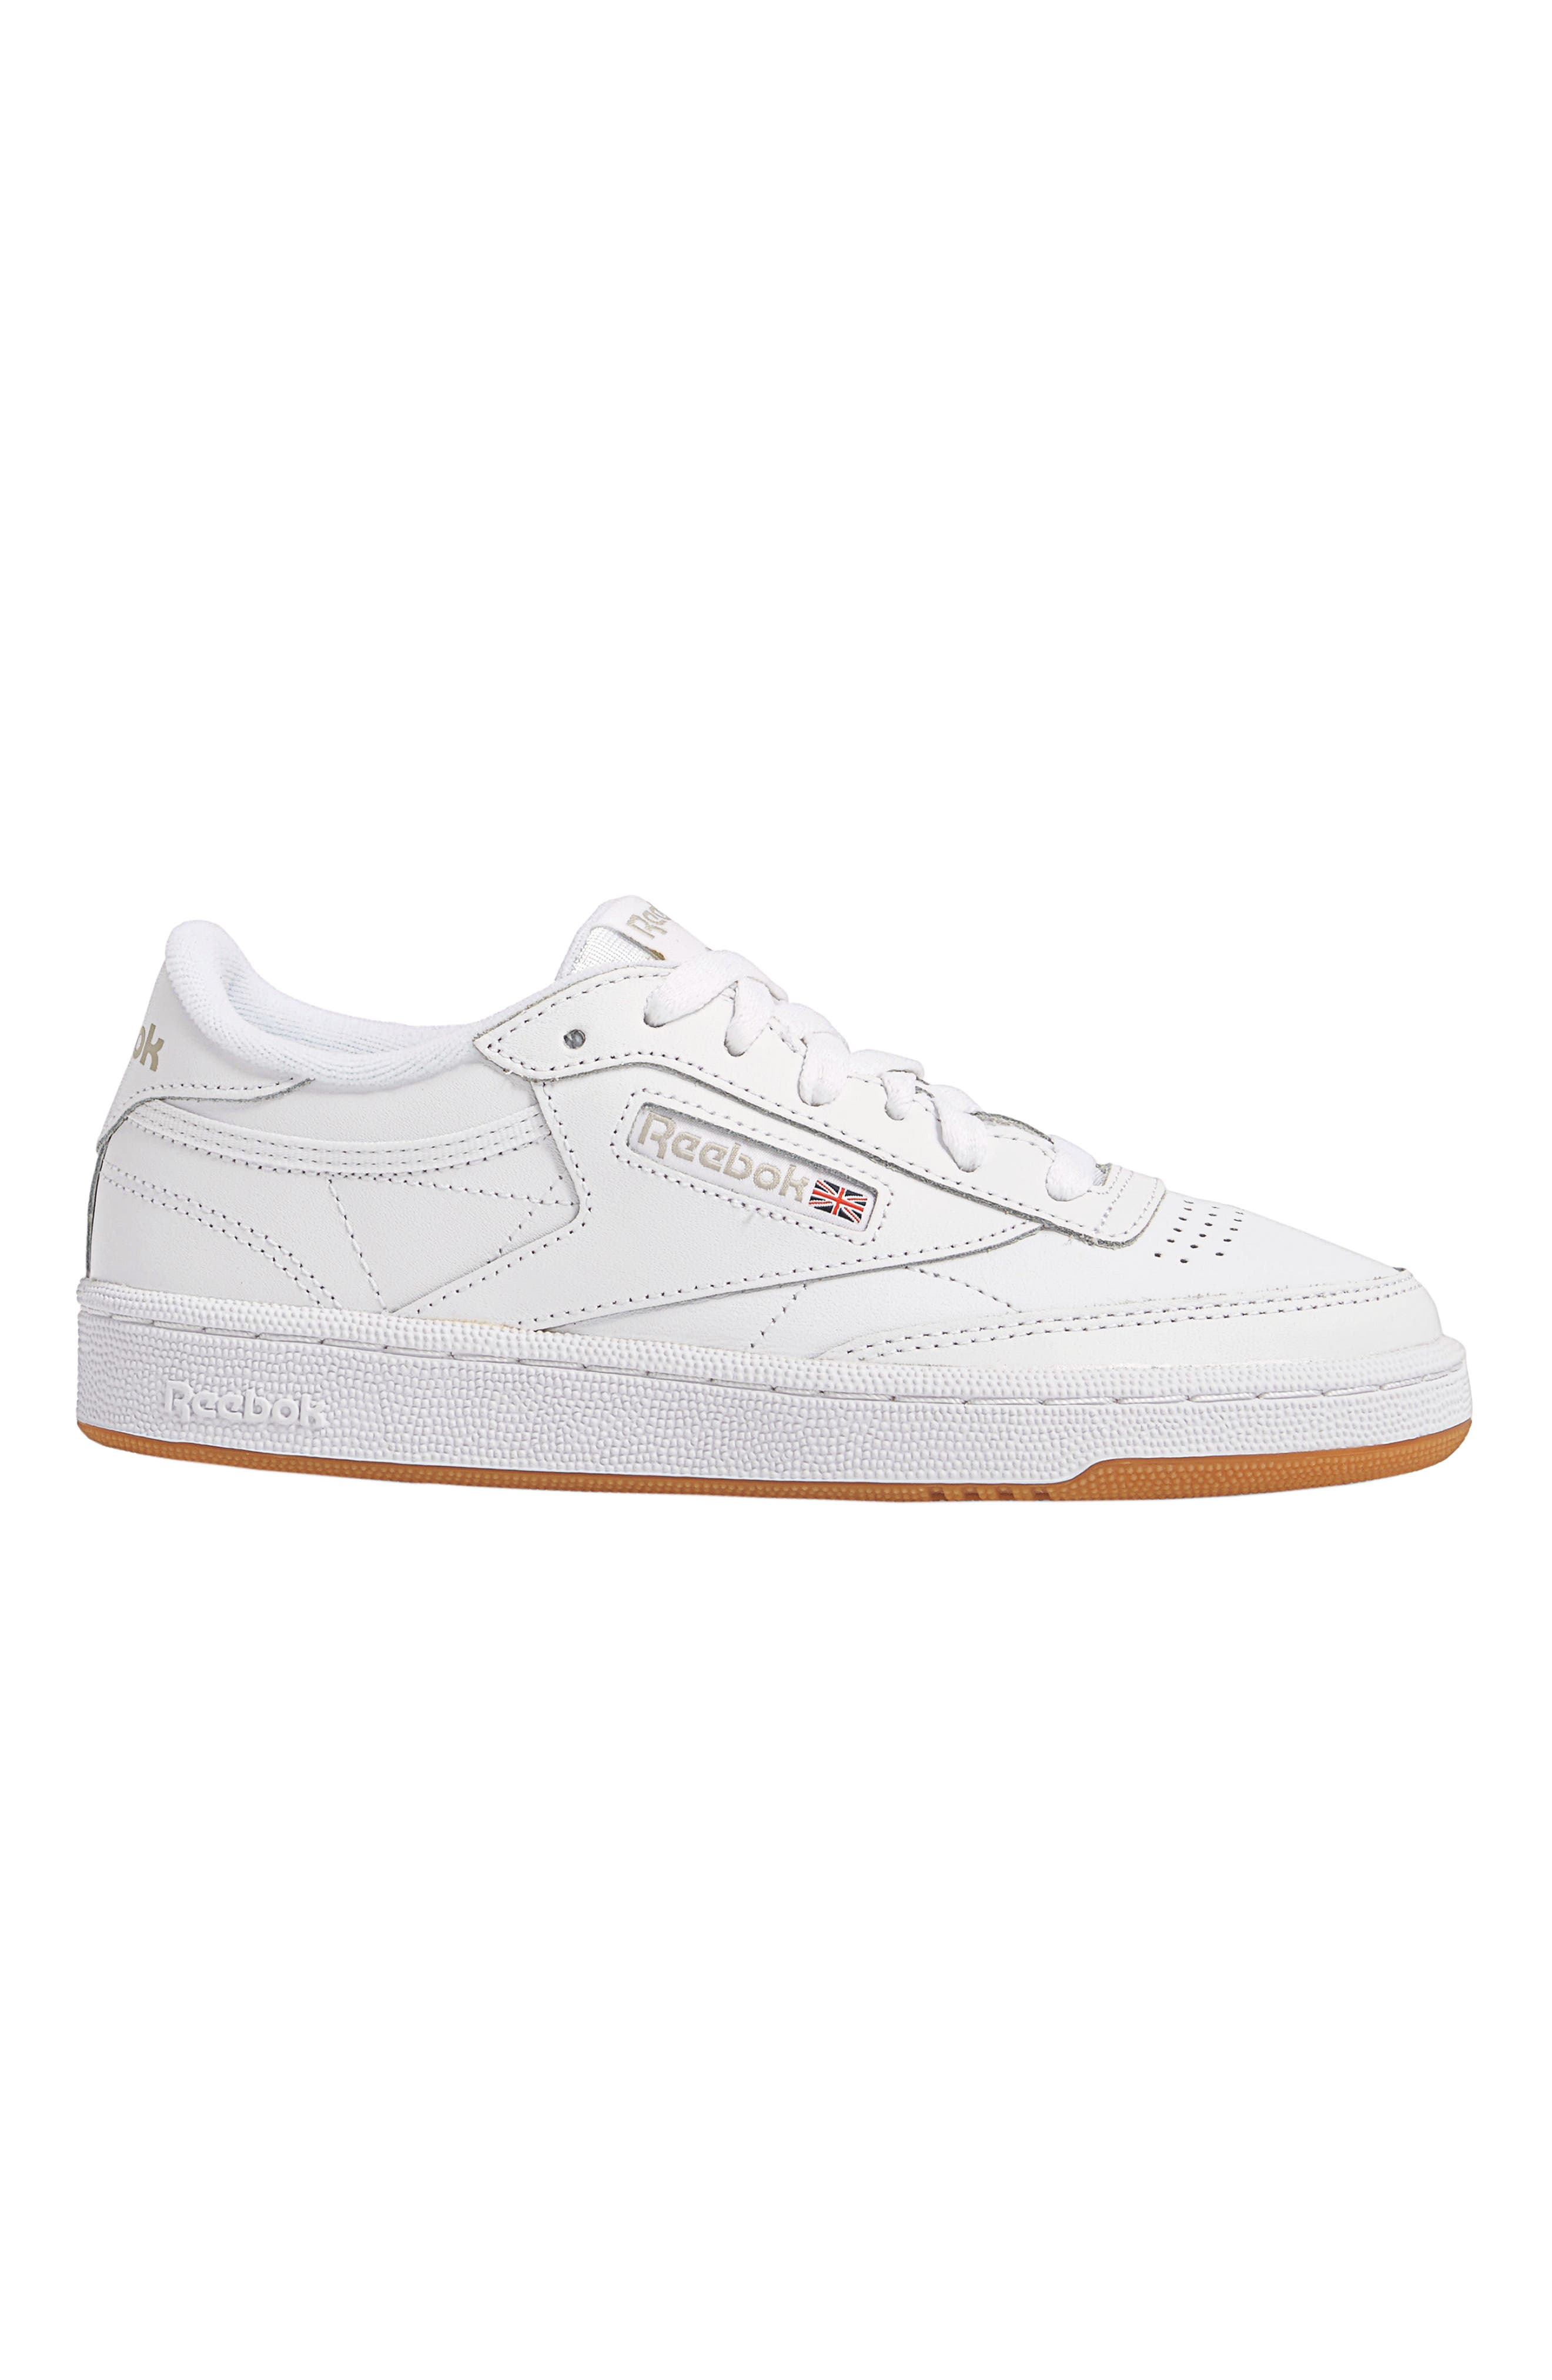 REEBOK, Club C 85 Sneaker, Alternate thumbnail 7, color, WHITE/ LIGHT GREY/ GUM